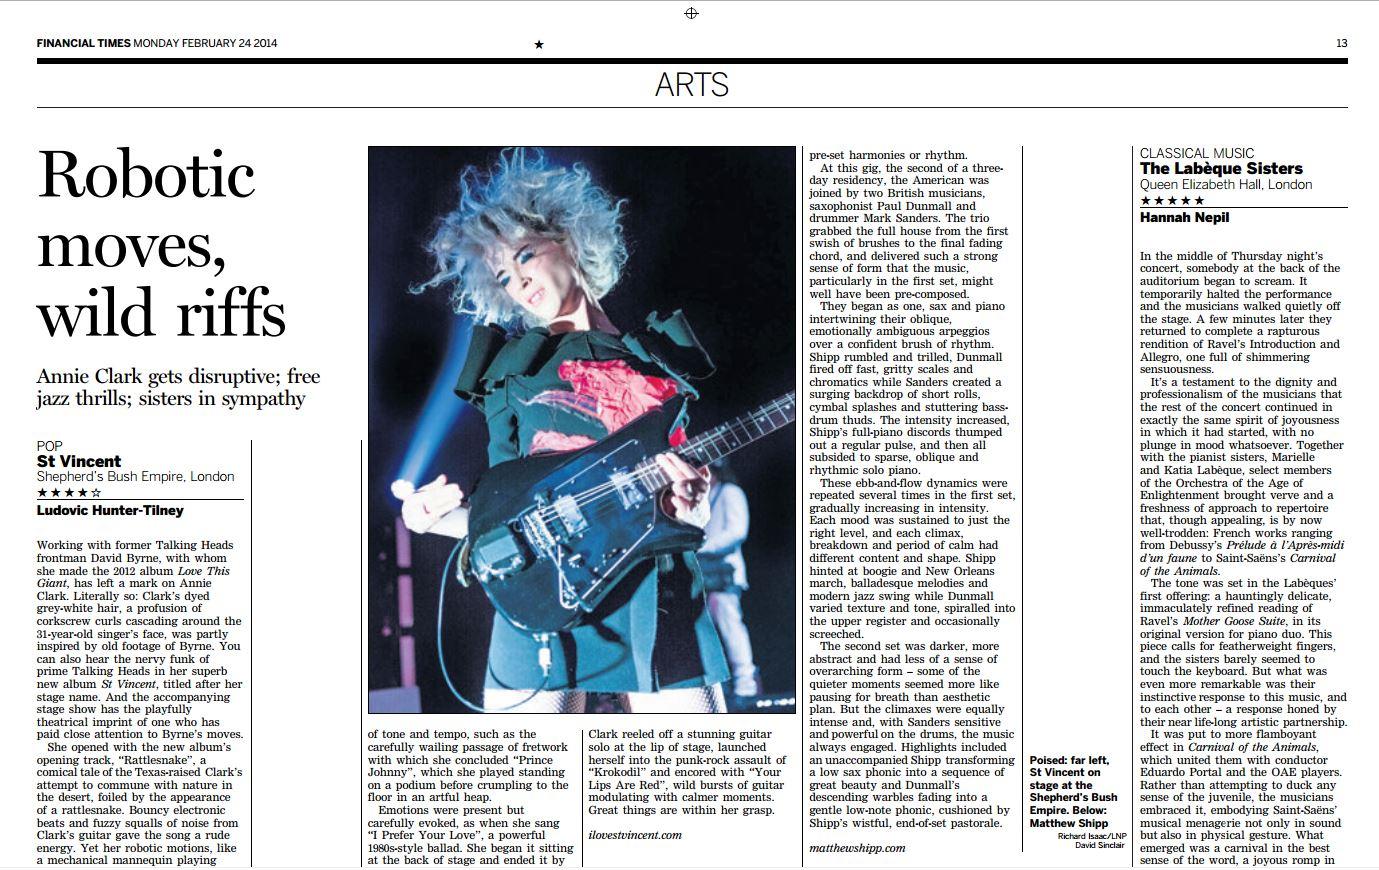 Image usage - Financial Times print edition 24/2/14 - St Vincent live at Shepherds Bush Empire, 20/1/14